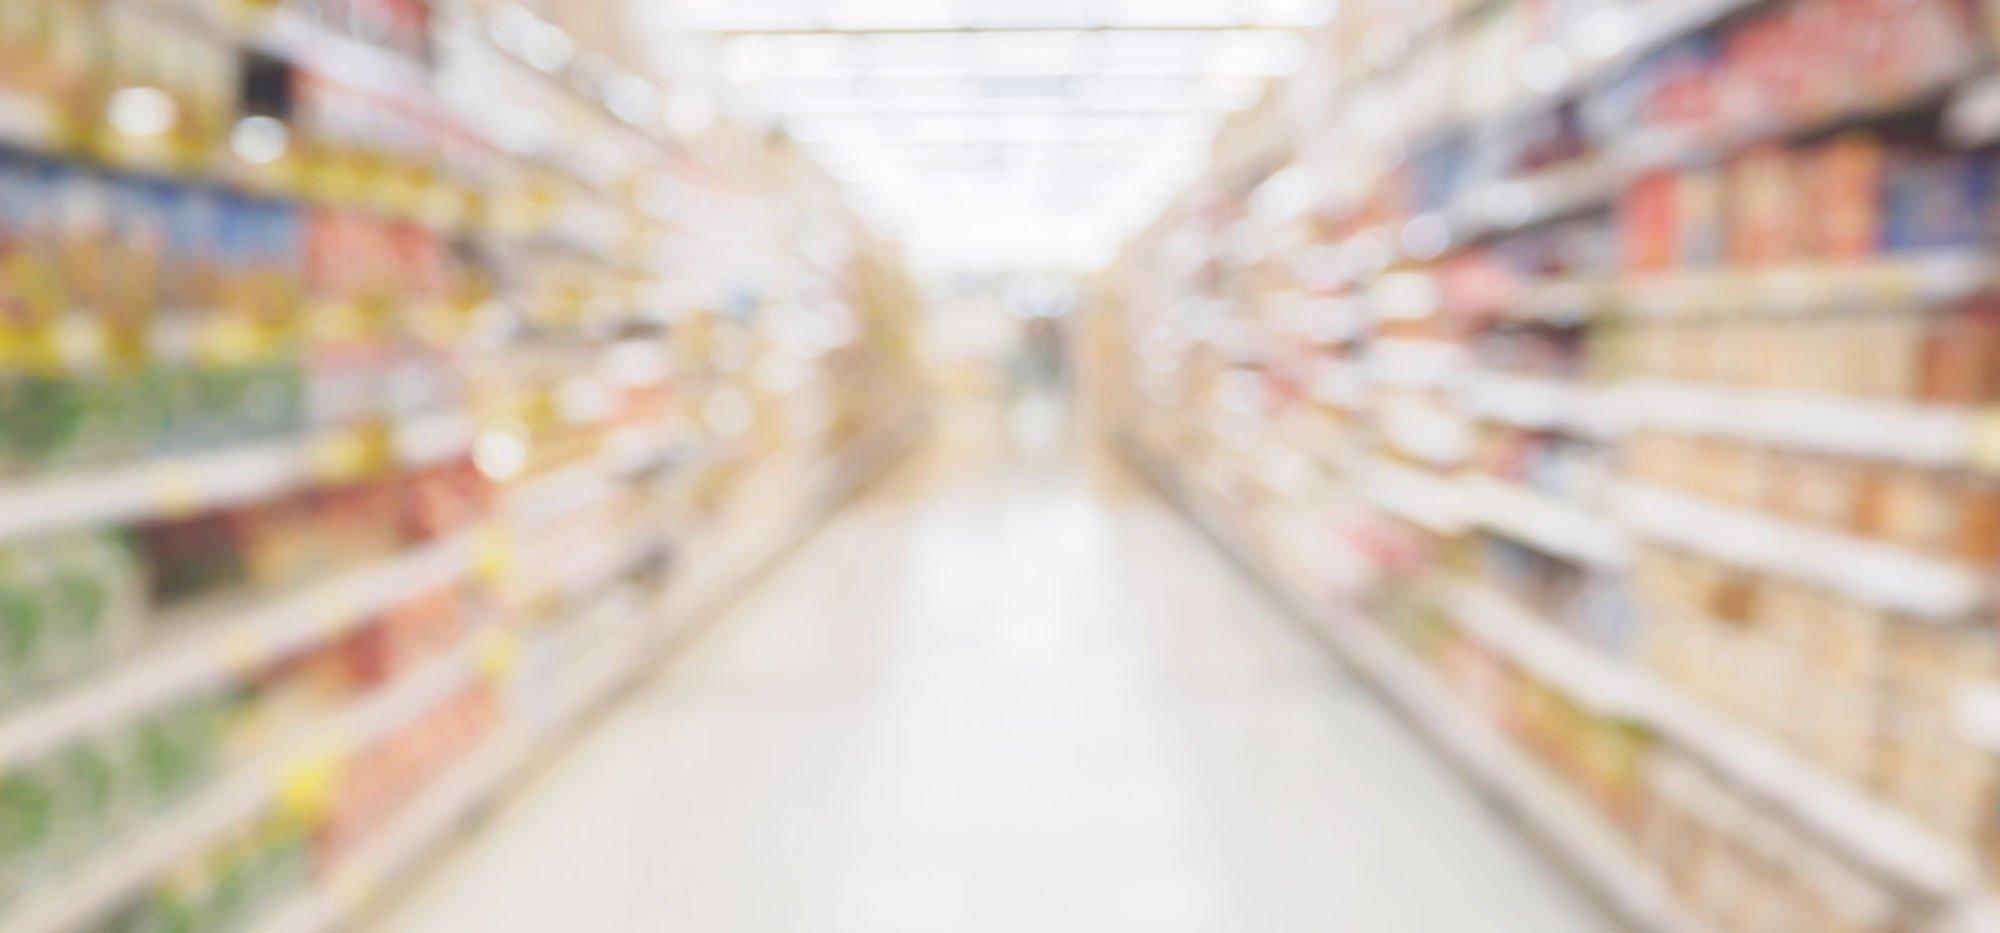 retail-aisle-web2.jpg